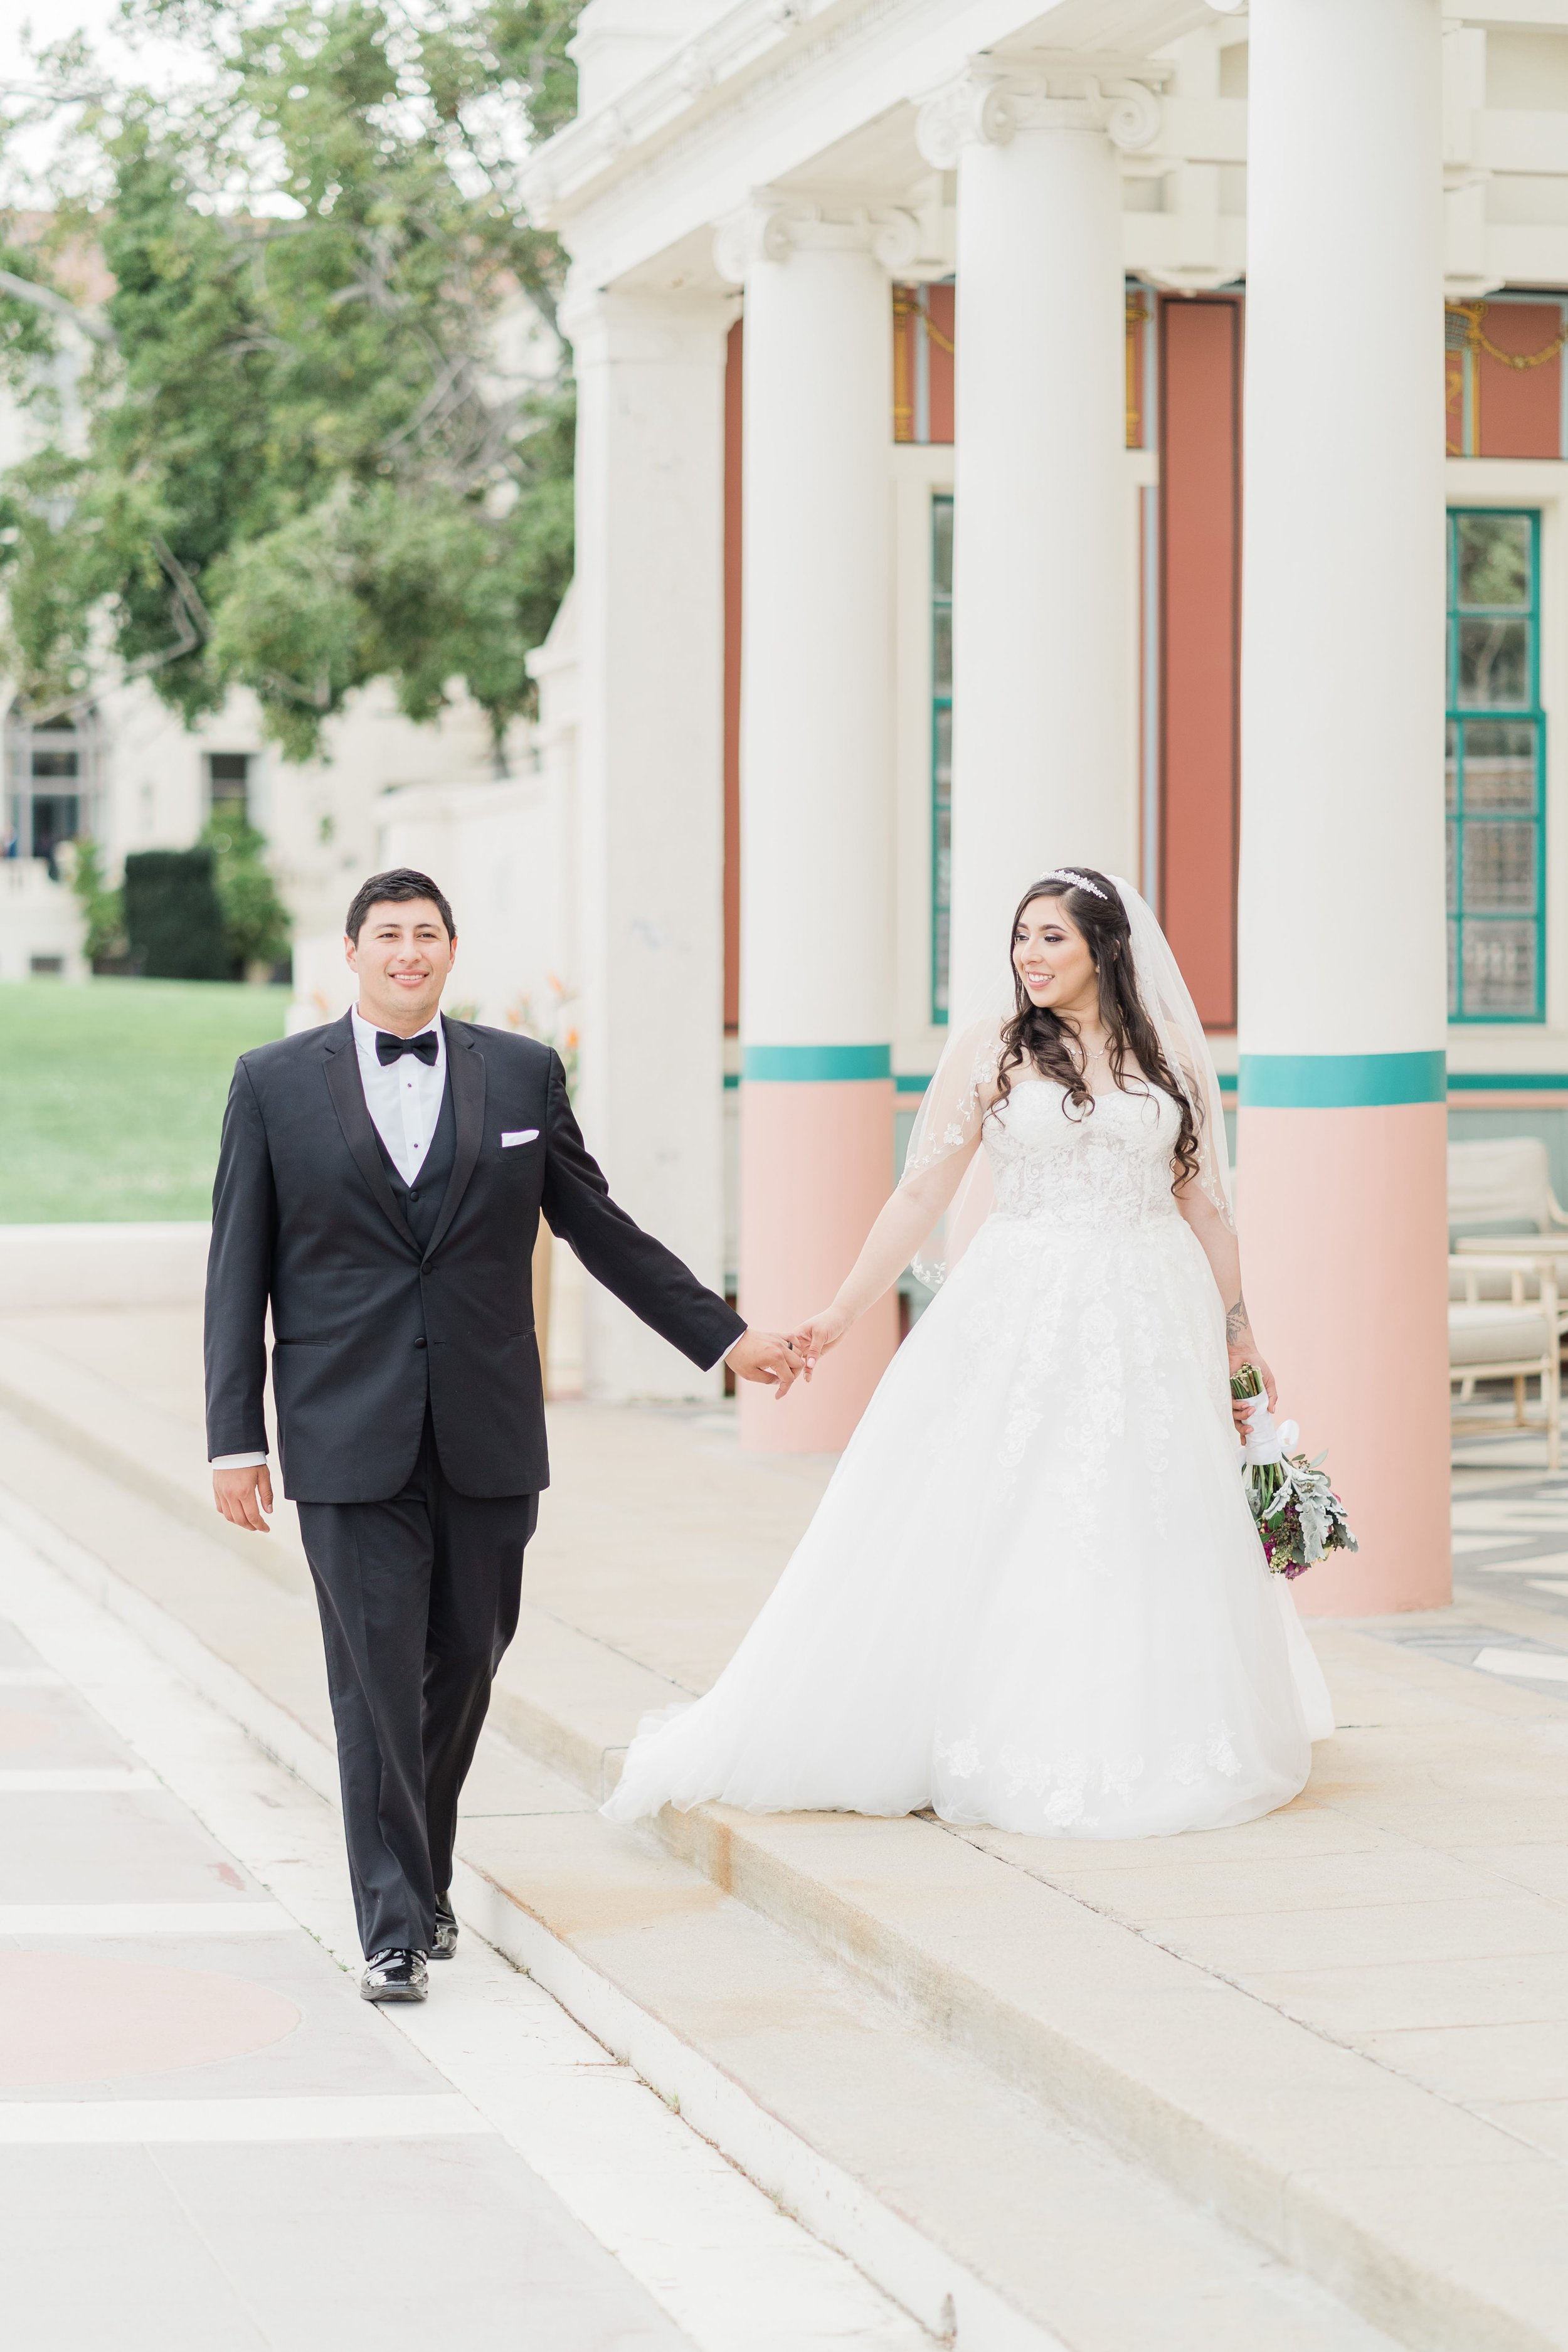 naval-postgraduate-school-wedding-in-monterey-ca-drew-zavala-photo-justin+janelle-2-min.jpg